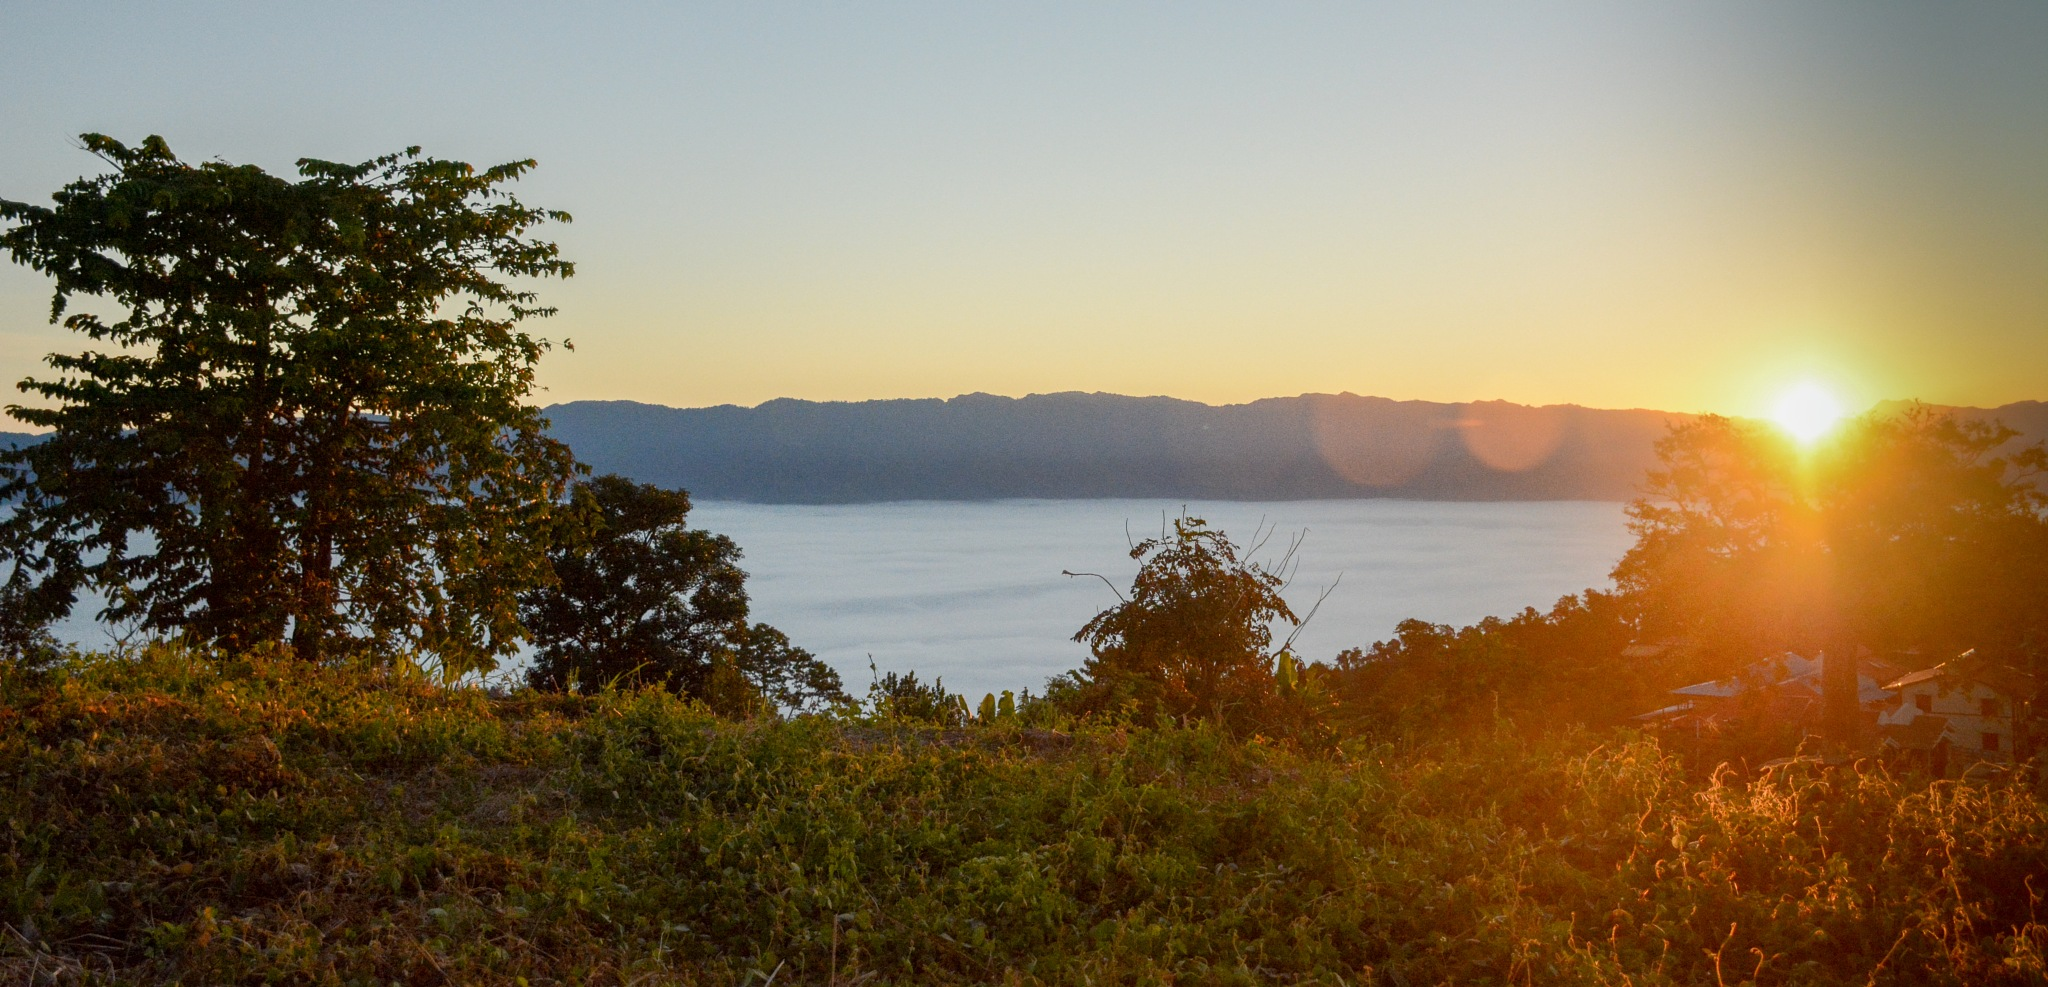 Sunrise in Sajek, Rangamati by hemal.khan.923